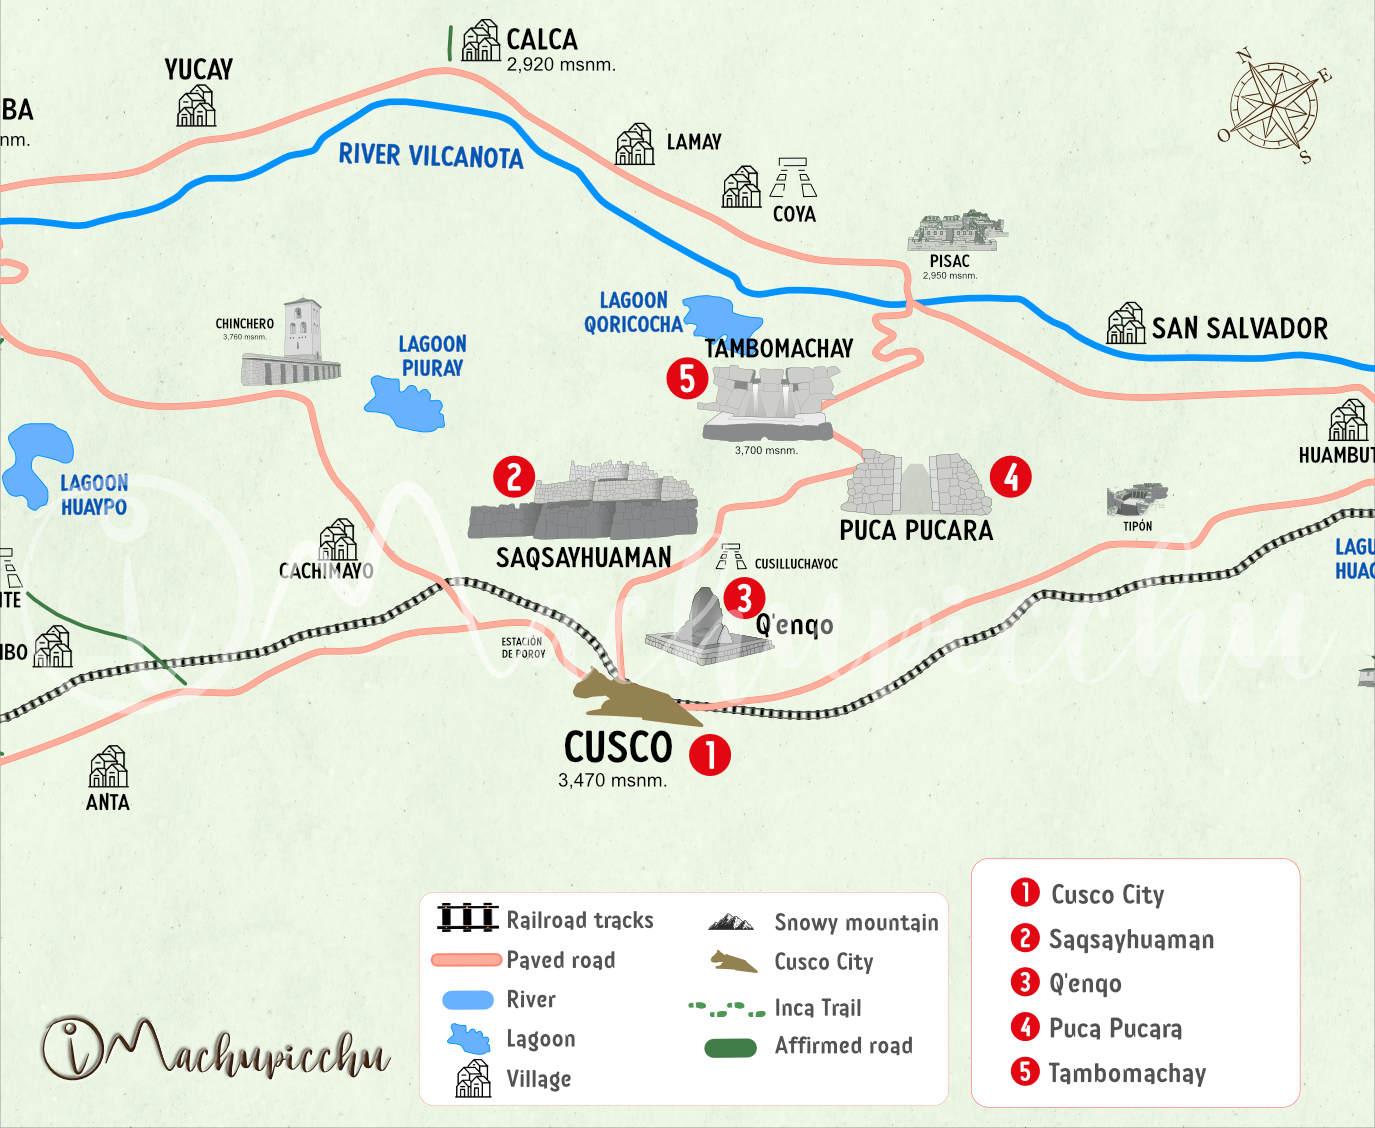 Circuit archaeological sites Cusco